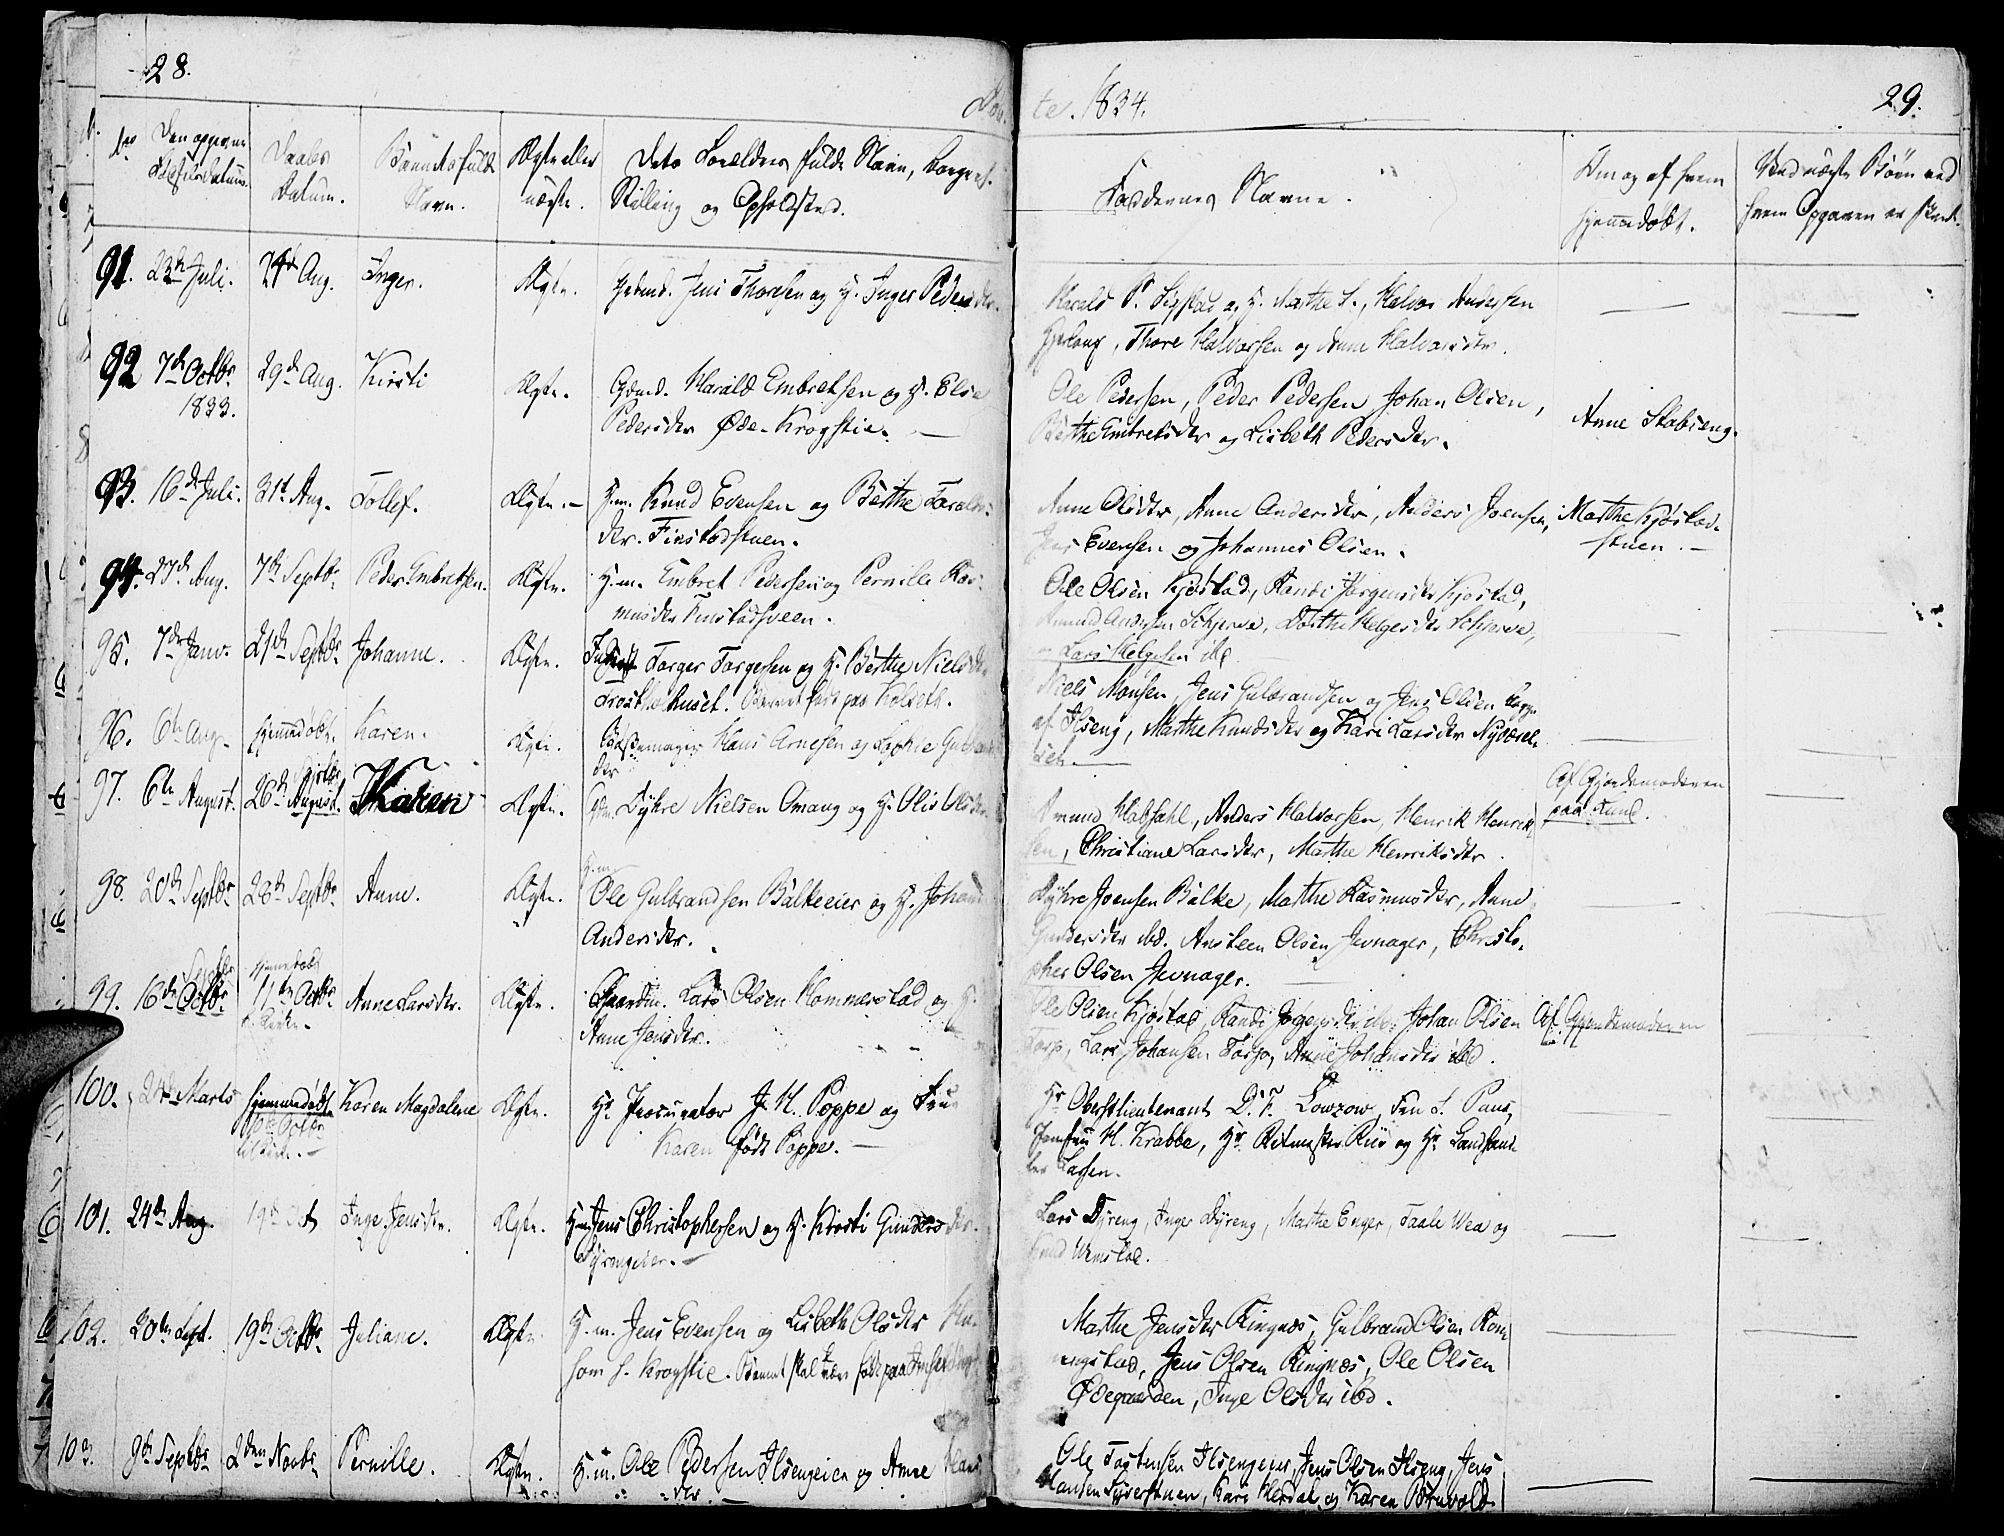 SAH, Løten prestekontor, K/Ka/L0006: Ministerialbok nr. 6, 1832-1849, s. 28-29